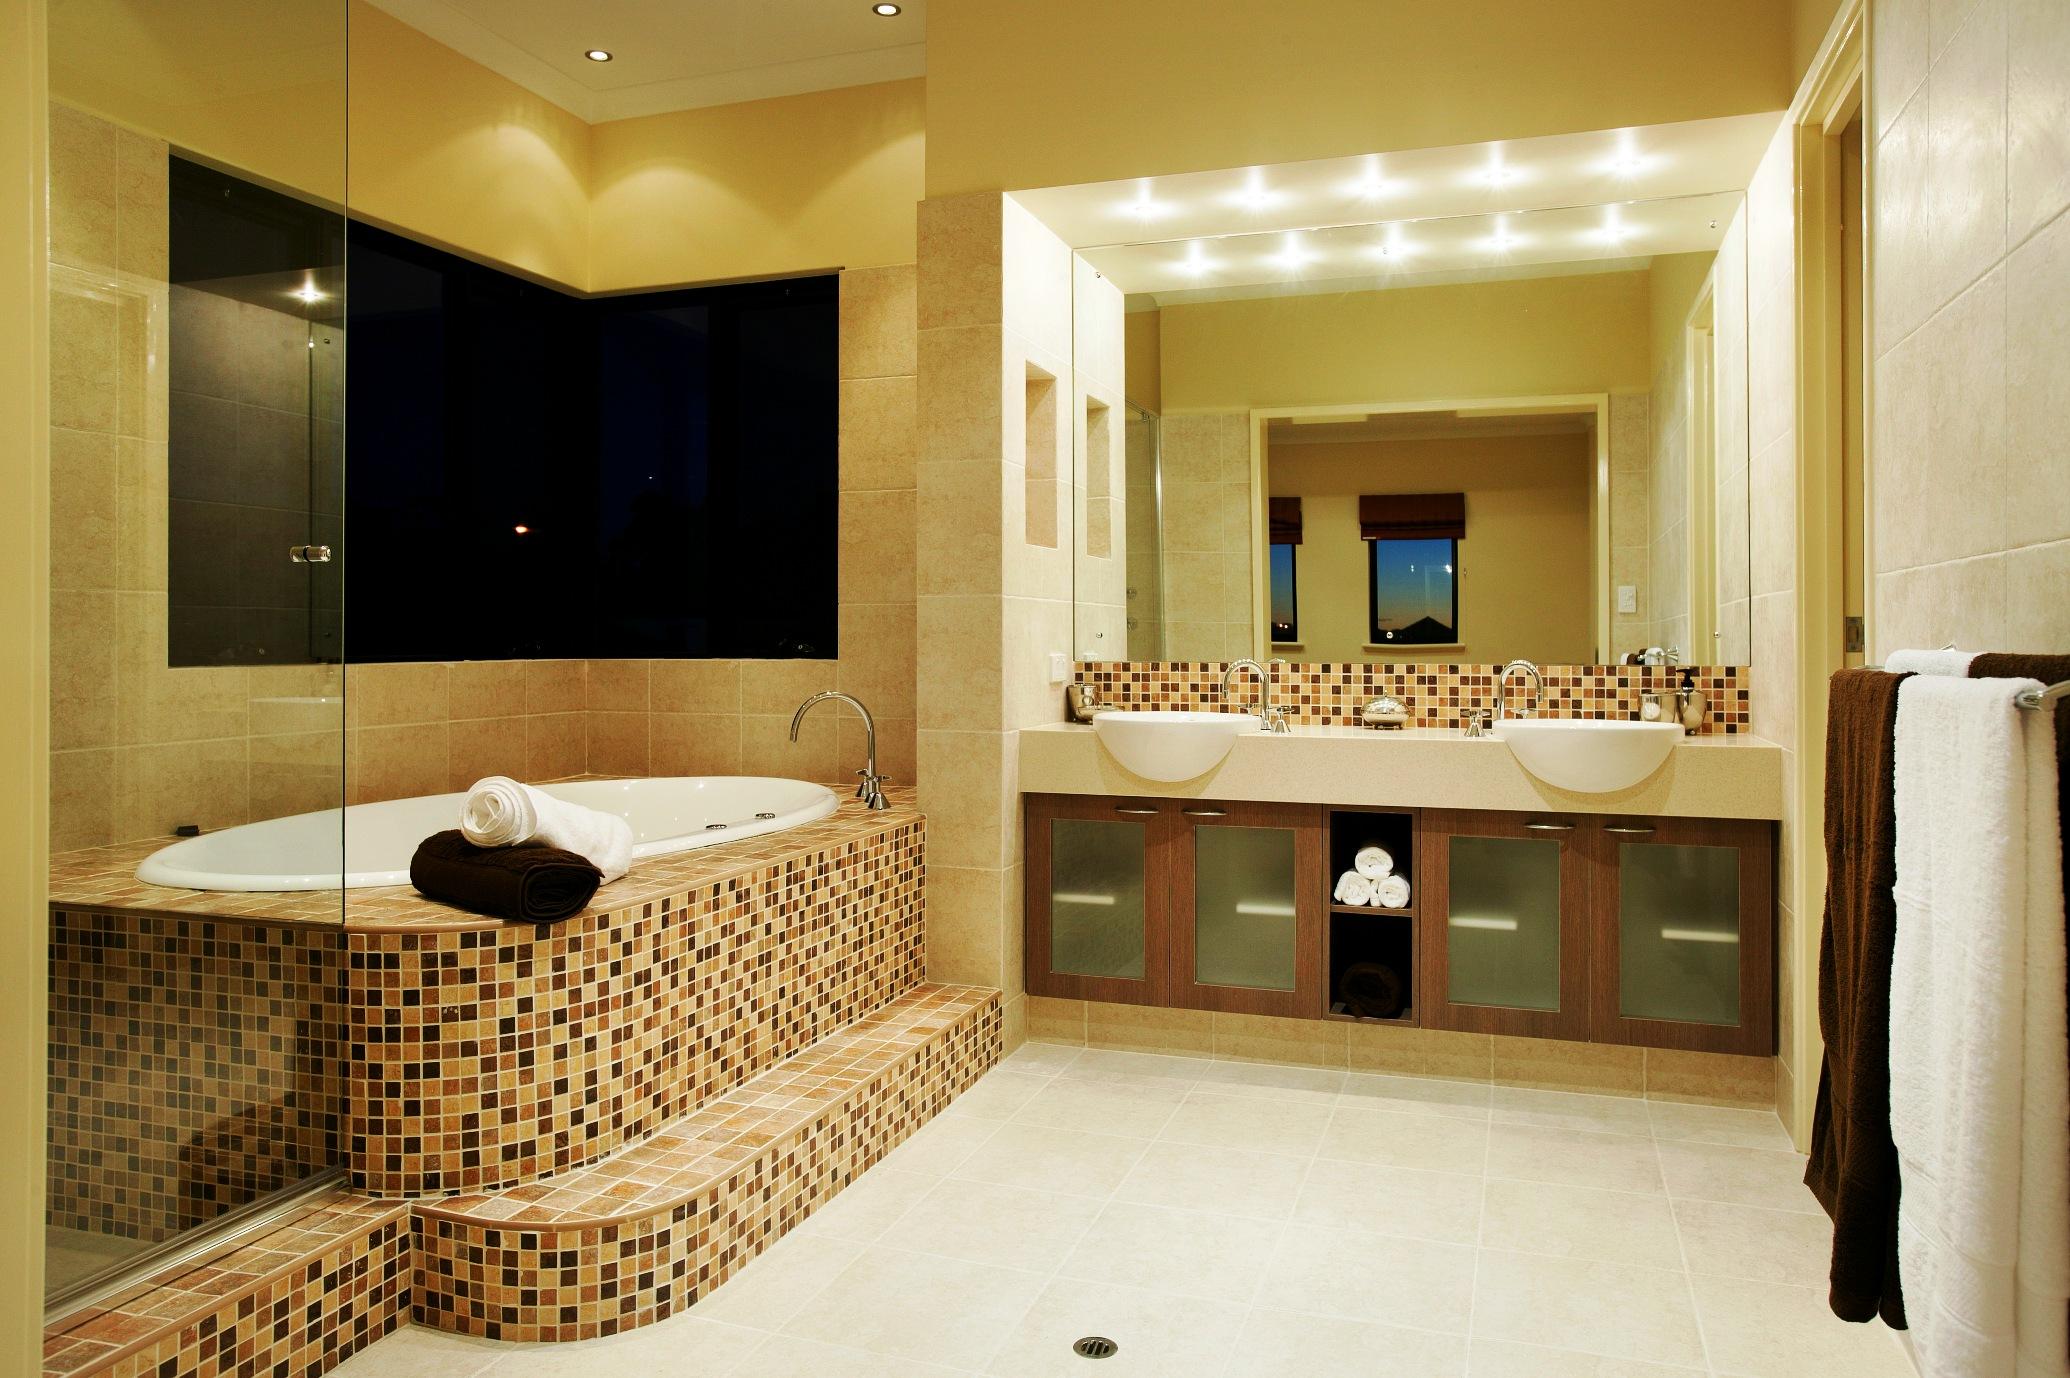 Magnificent Bathroom Design Bathroom Interior Design Bathroom Renovation Largest Home Design Picture Inspirations Pitcheantrous